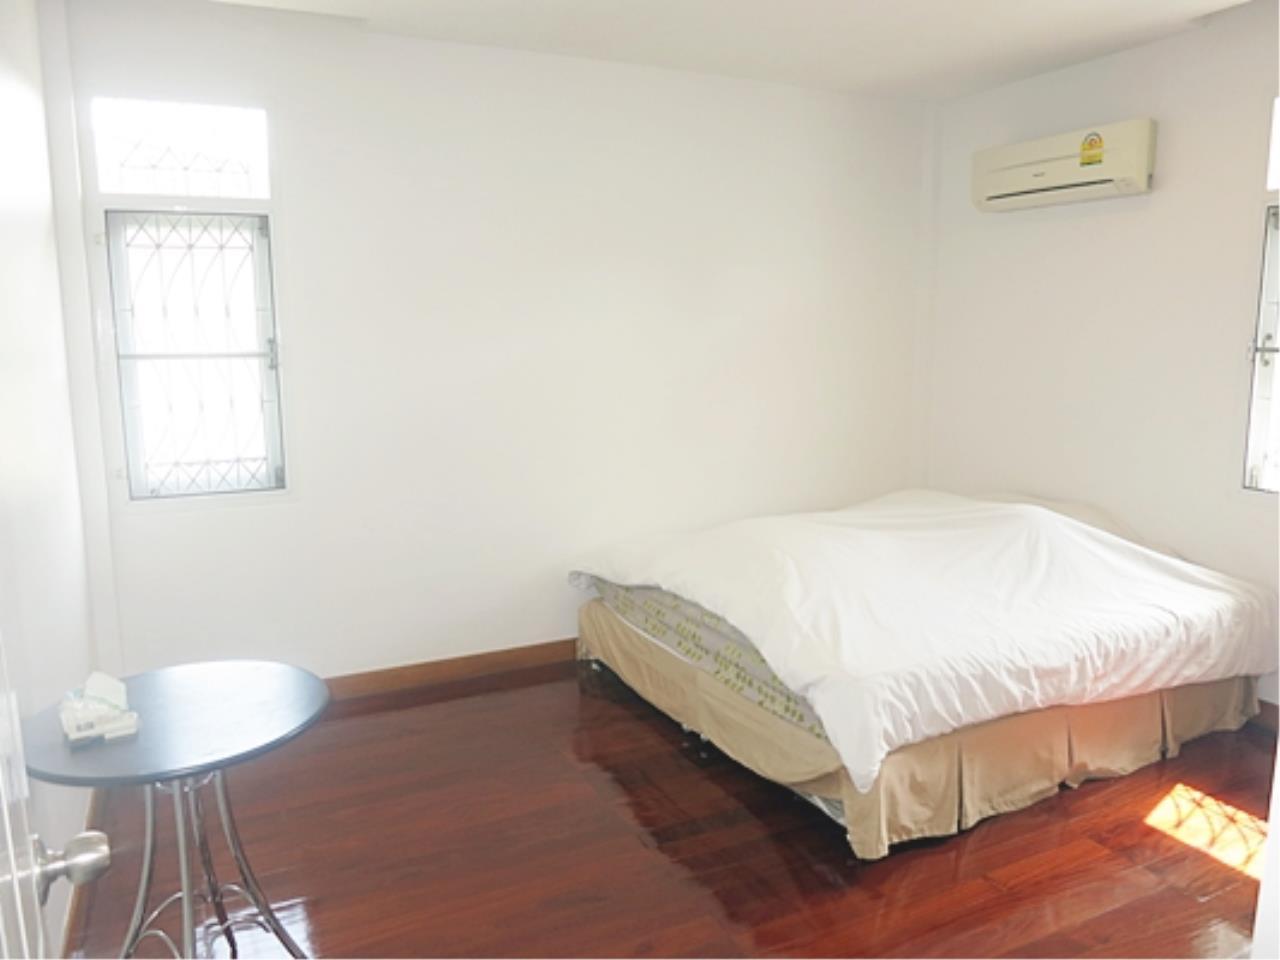 Estate Corner Agency (Samut Prakan) Agency's Single house for sale Ladprao, fully furnished. 20